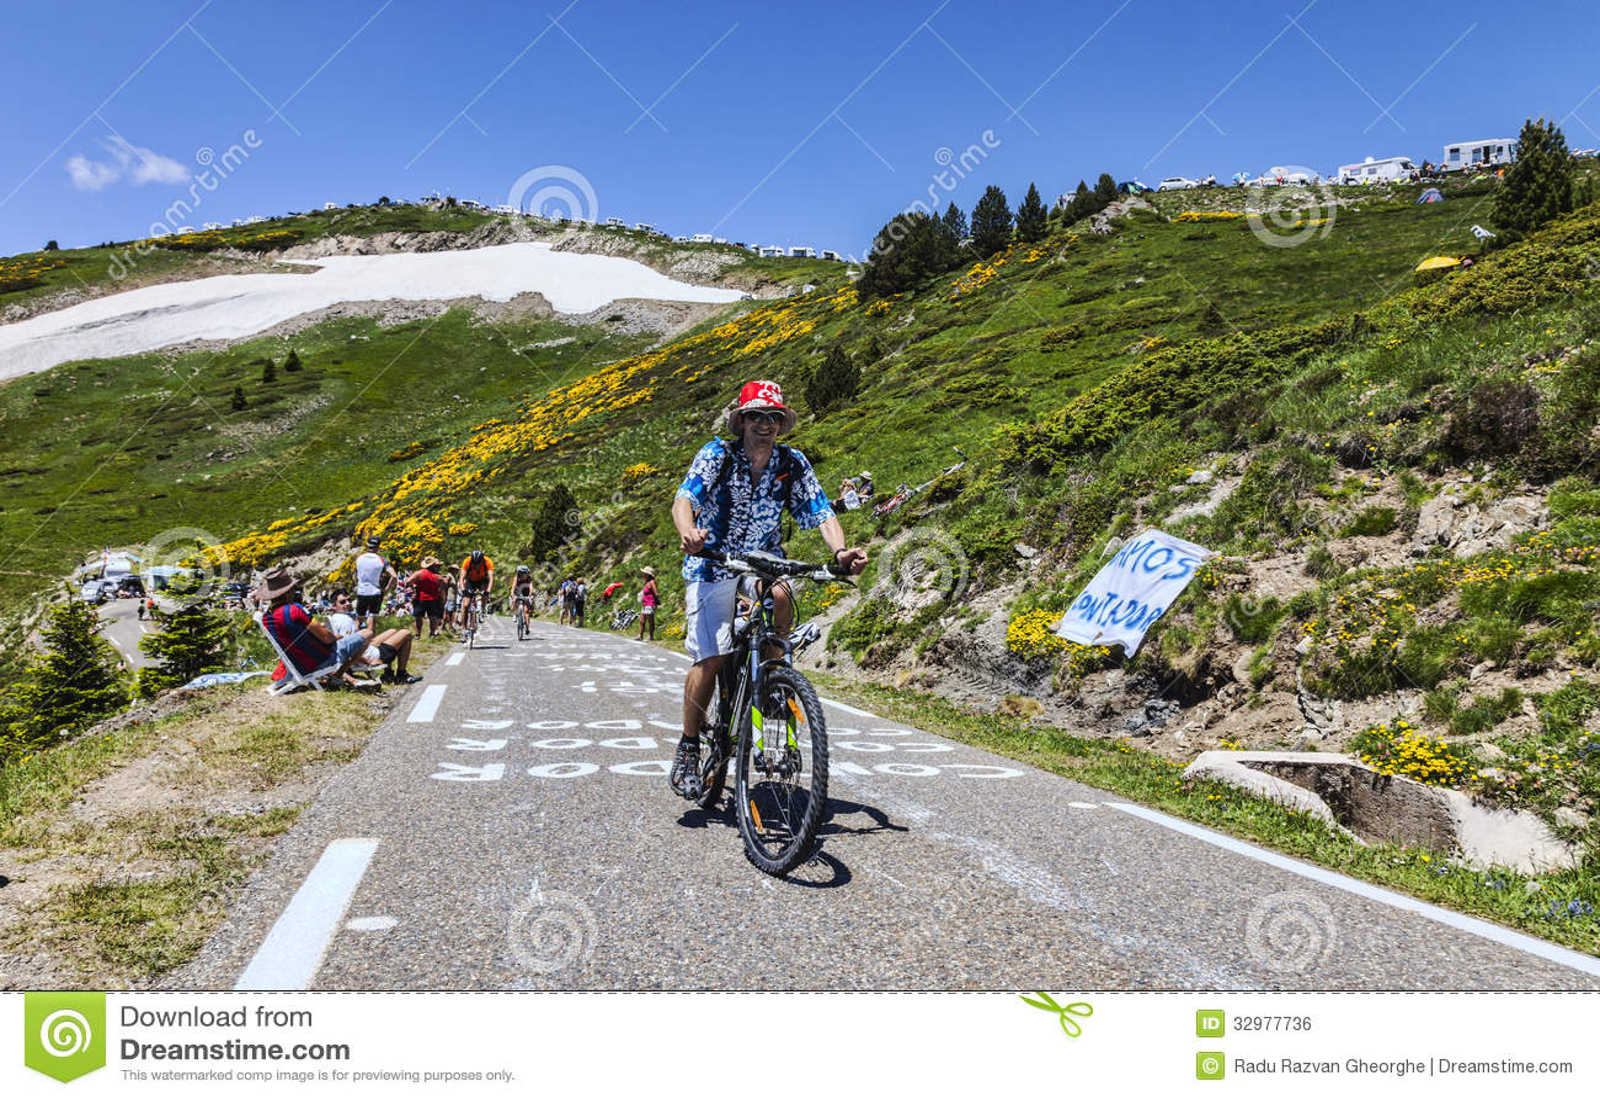 Le环法自行车赛爱好者